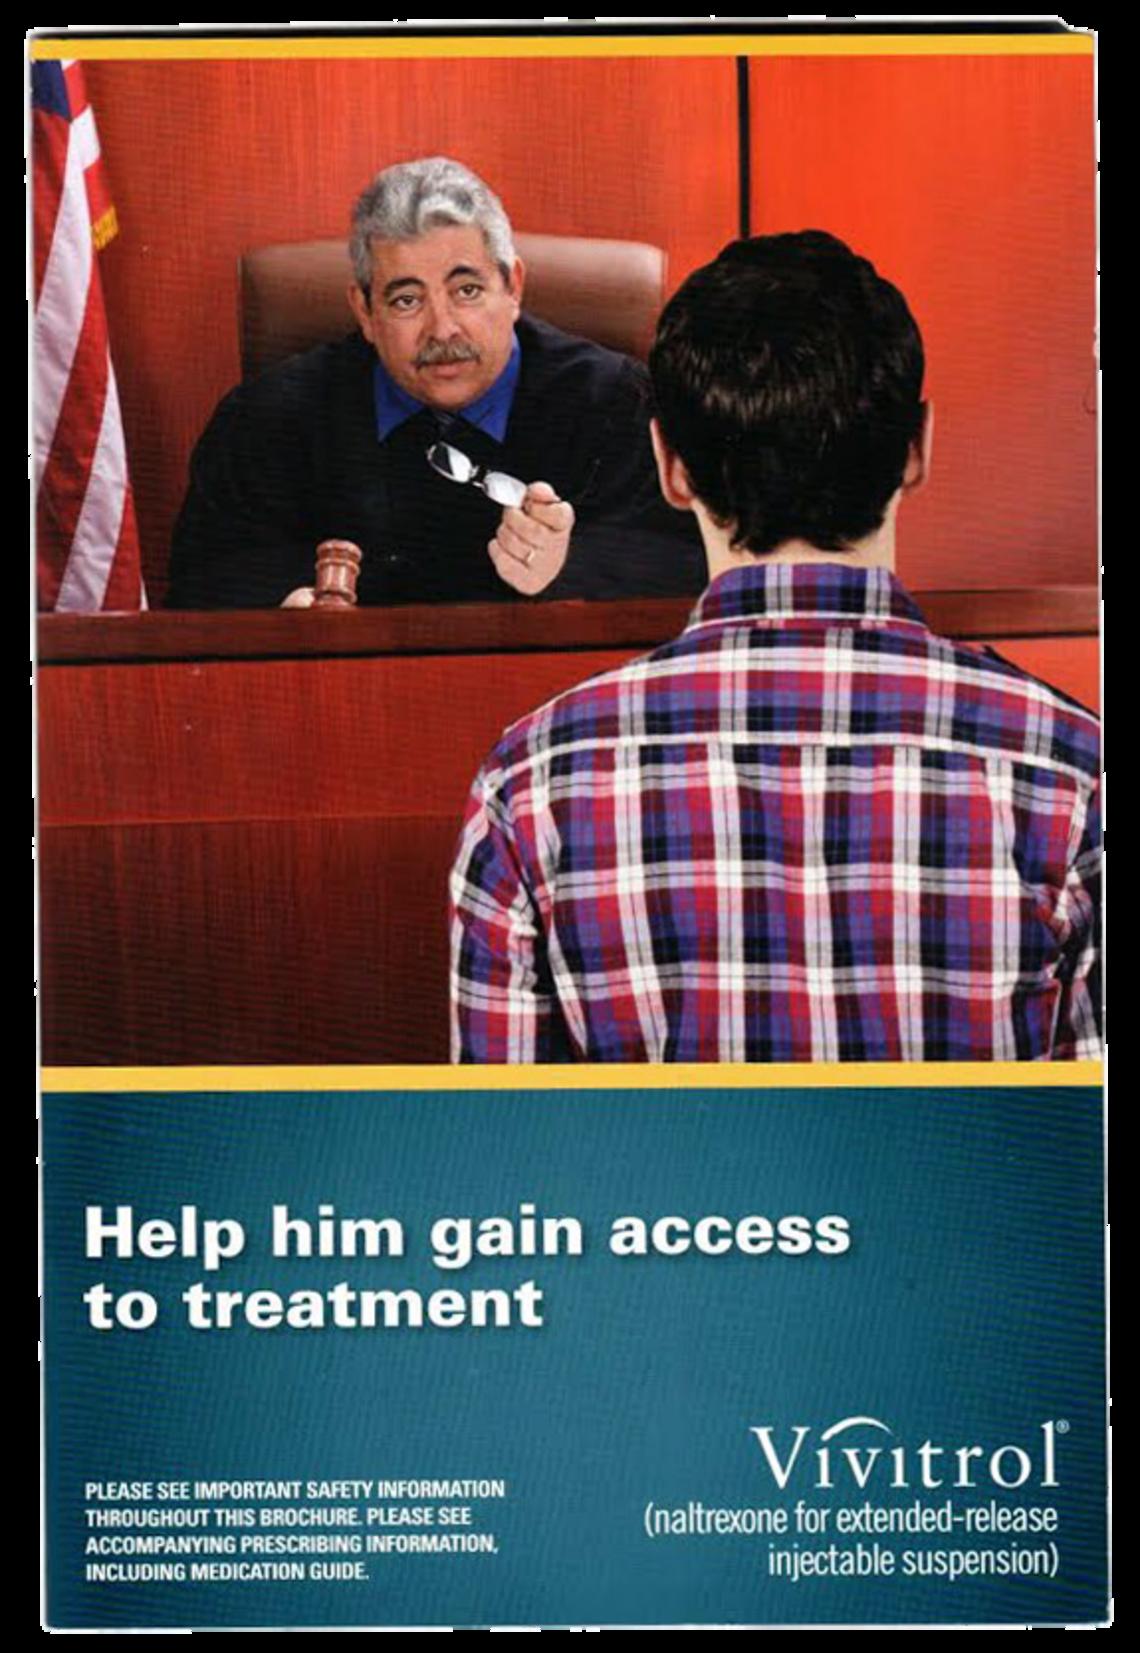 A brochure about Vivitrol targets court officials and law enforcement.